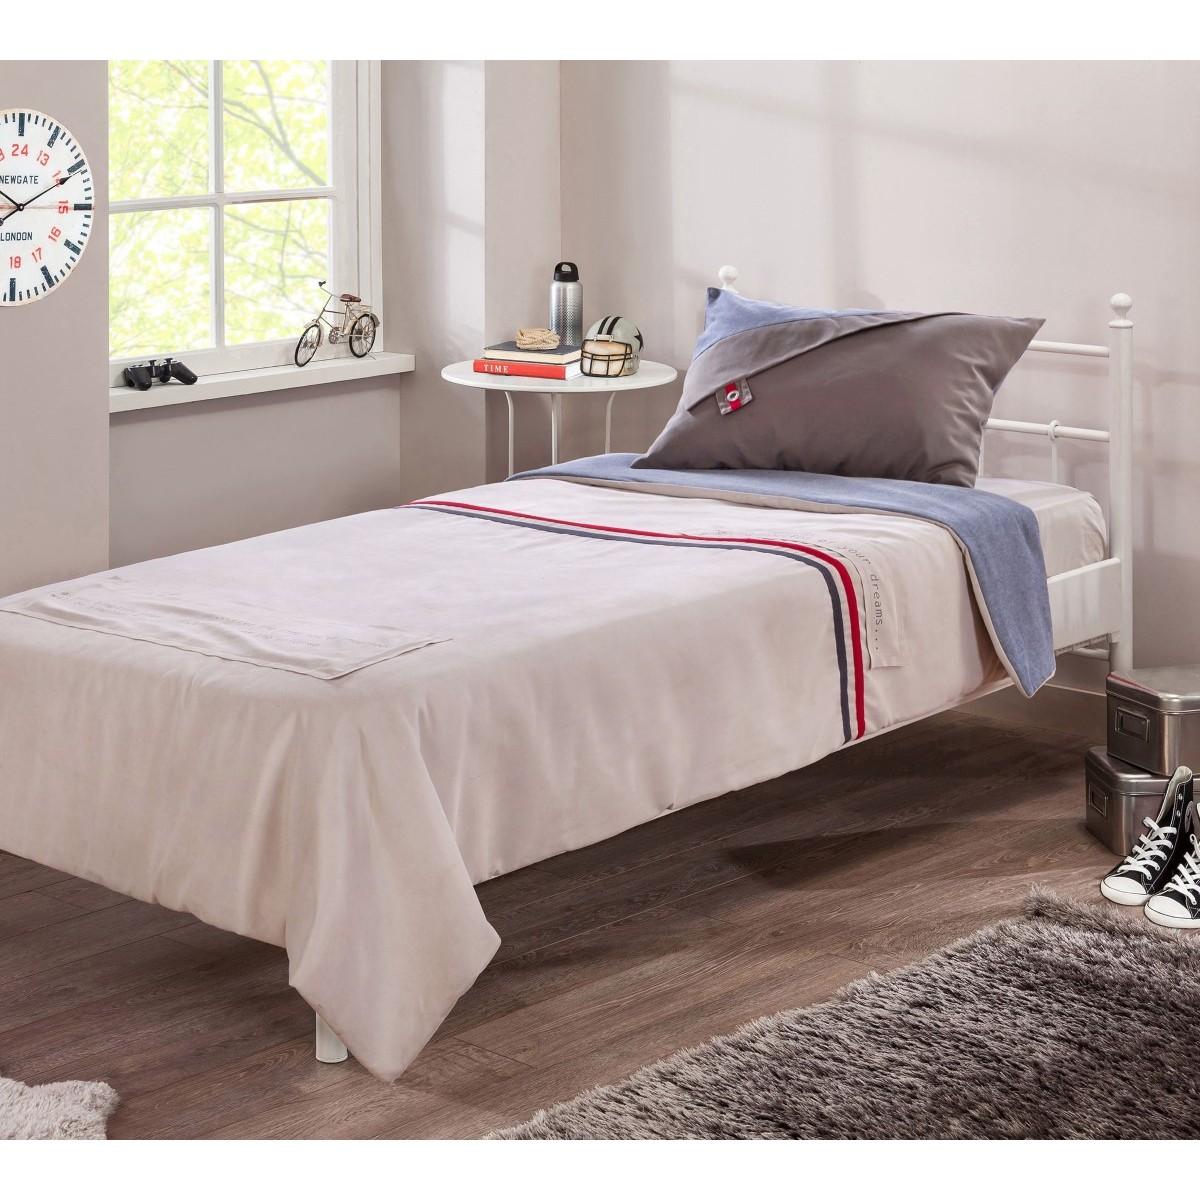 trio bedsprei kussen amerikaanse jongenskamer gratis verzending kinderkamer kinderbed. Black Bedroom Furniture Sets. Home Design Ideas